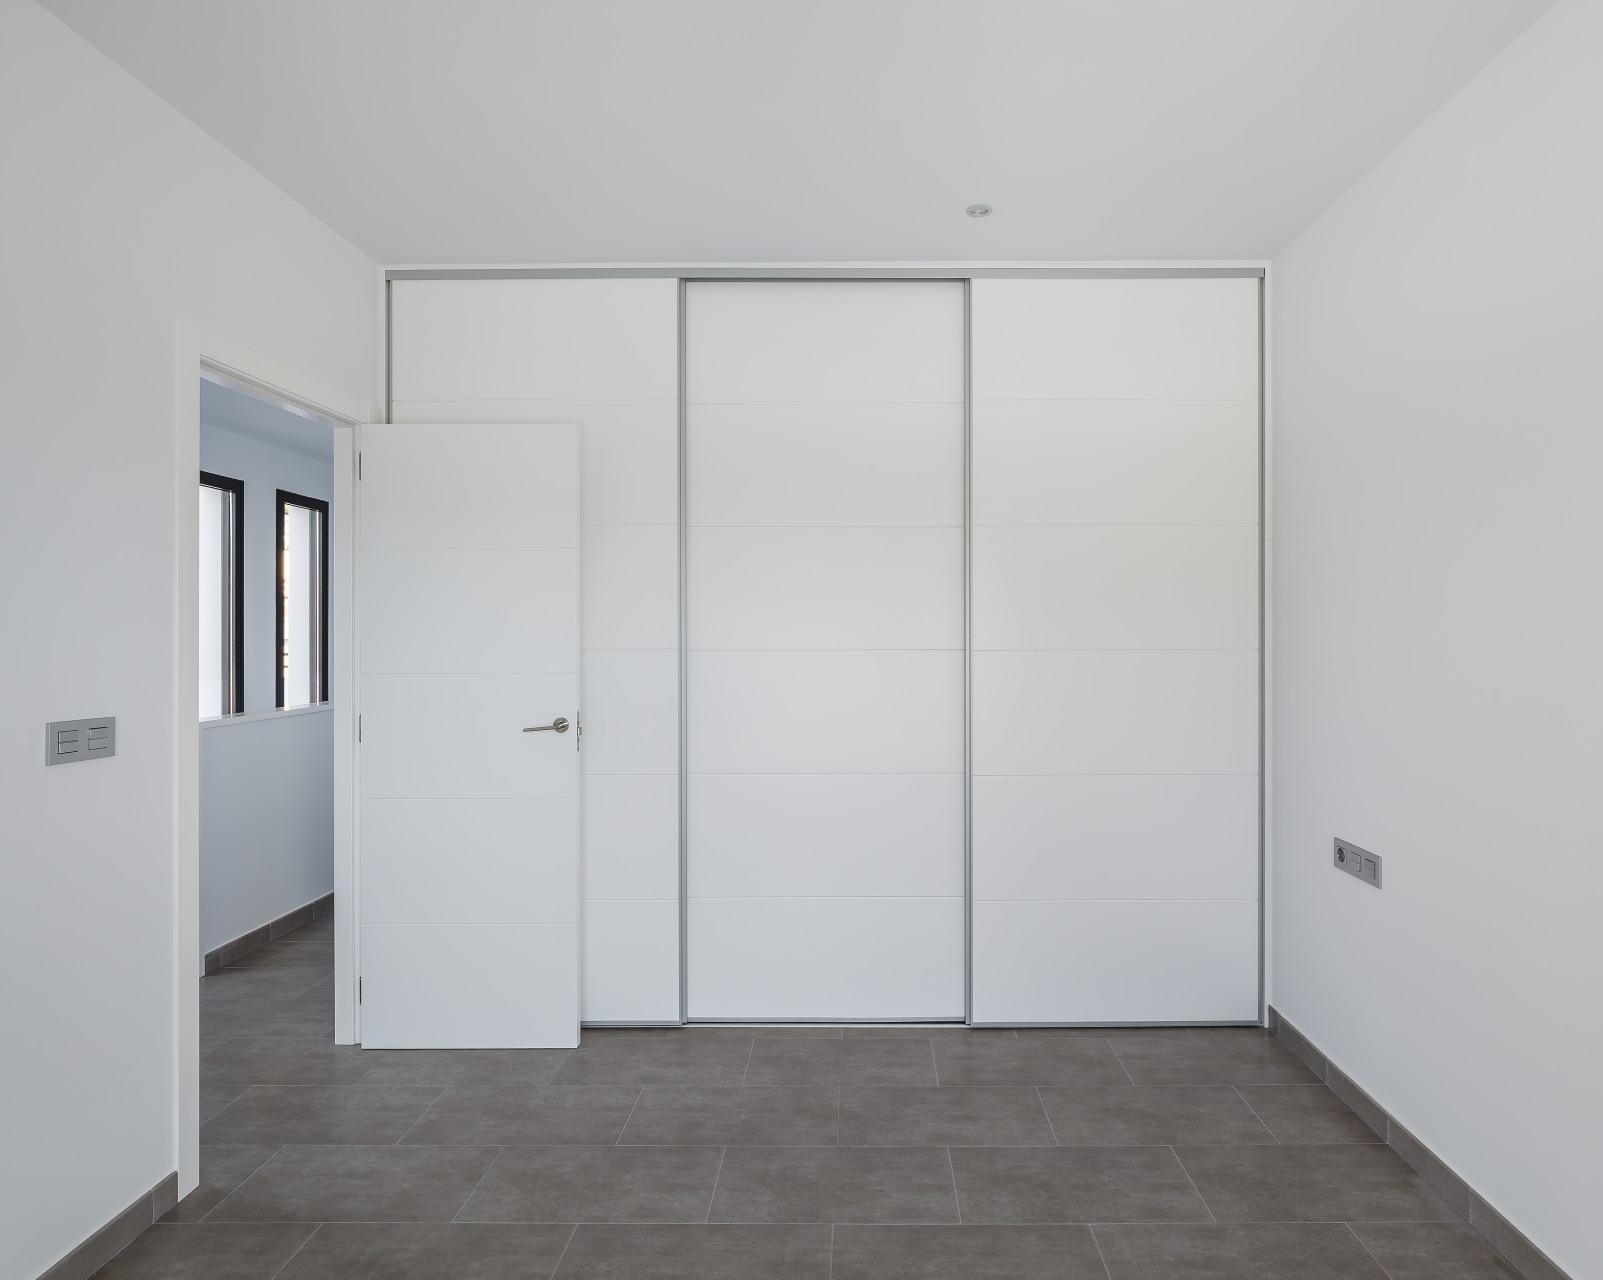 fotografia-arquitectura-valencia-german-cabo-viraje-vivienda-unifamiliar-calpe (36)